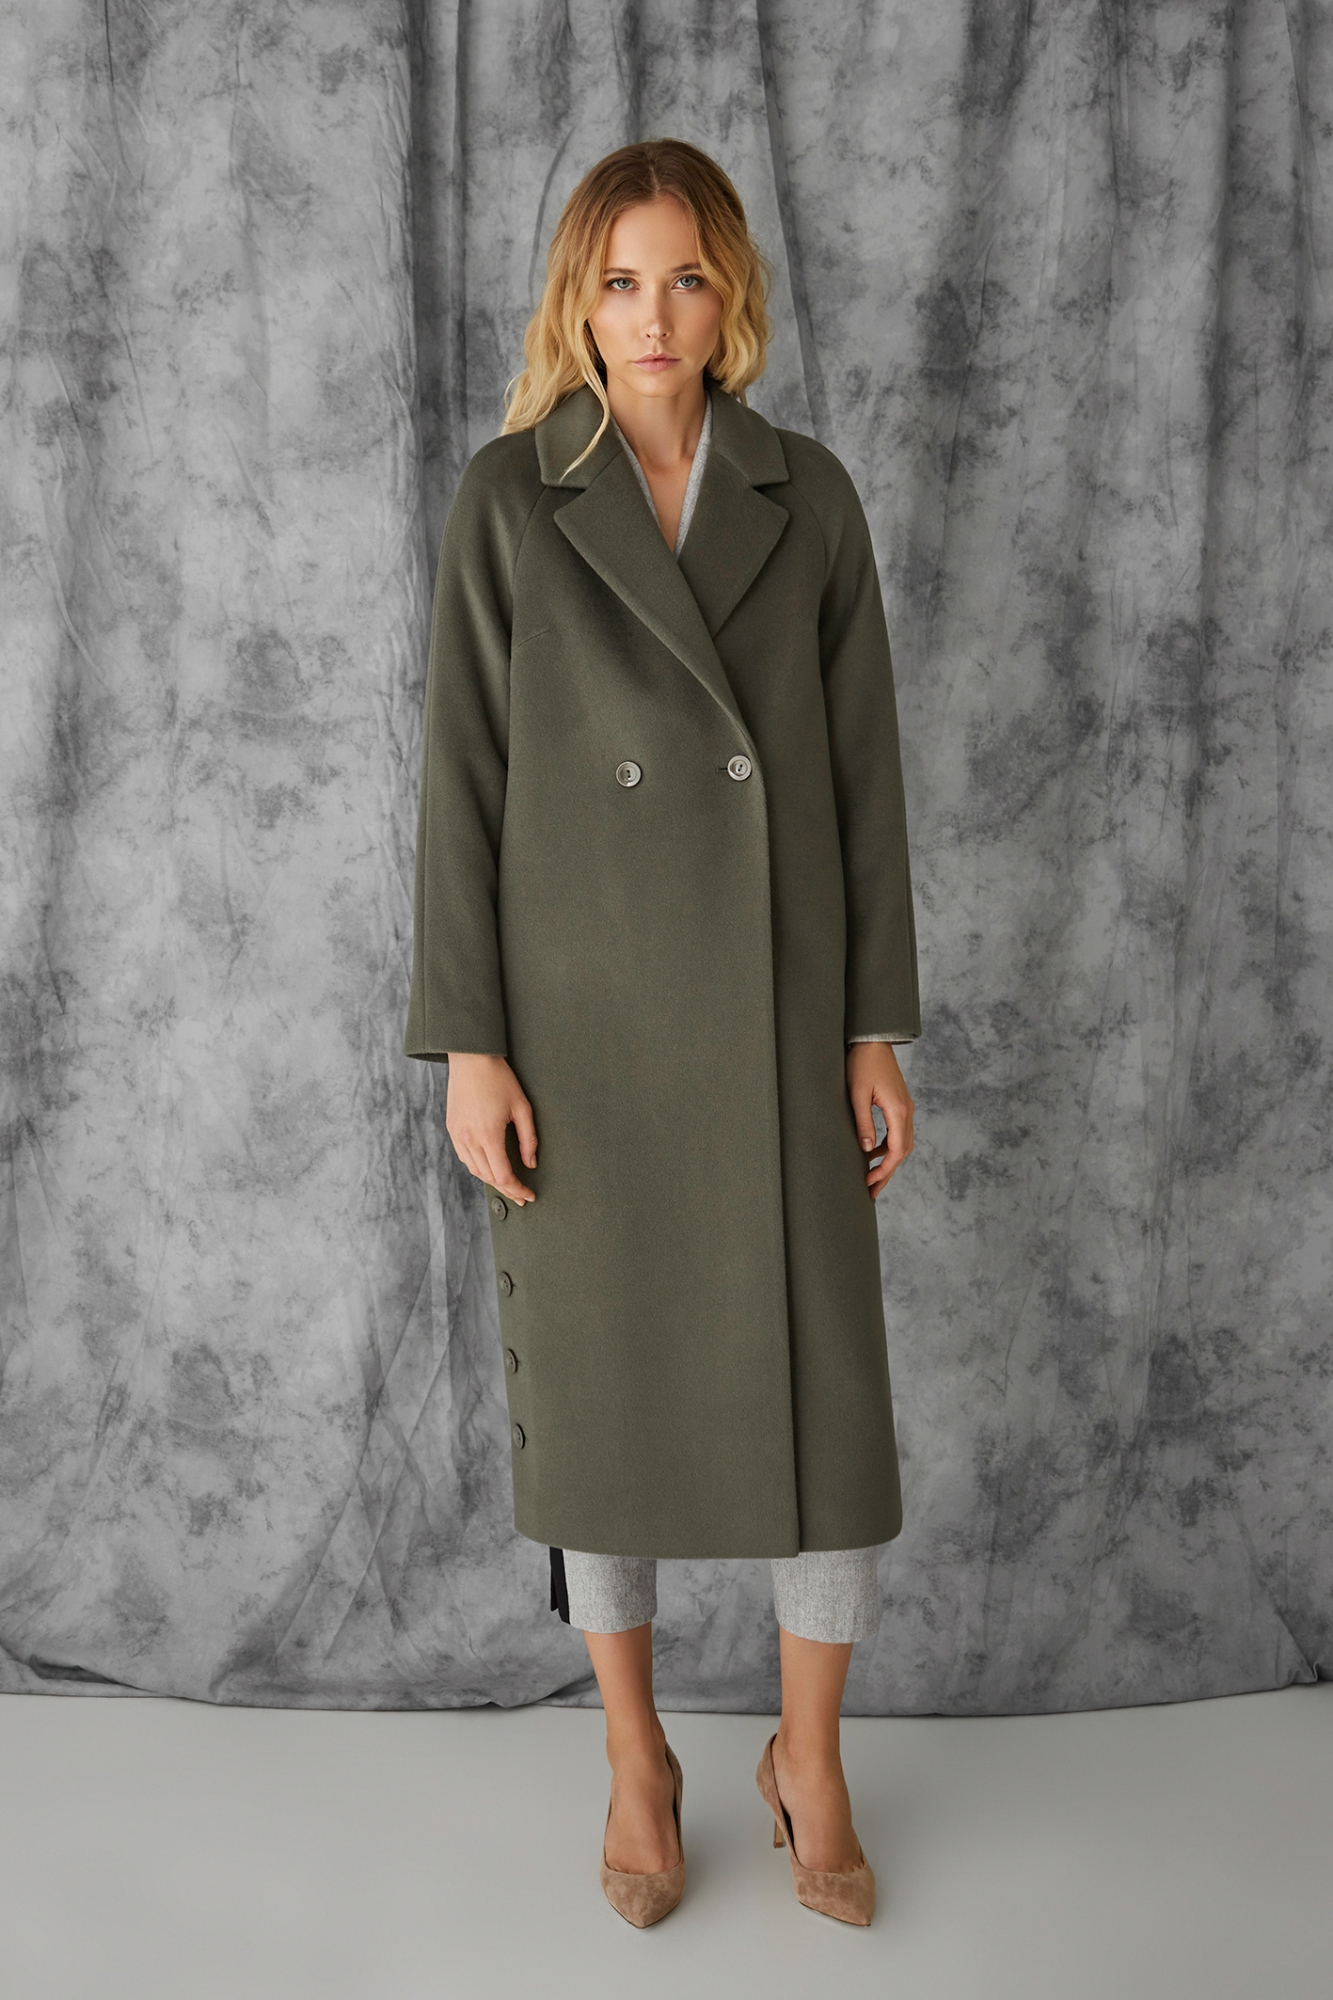 Shi shi пальто модели онлайн светлогорск